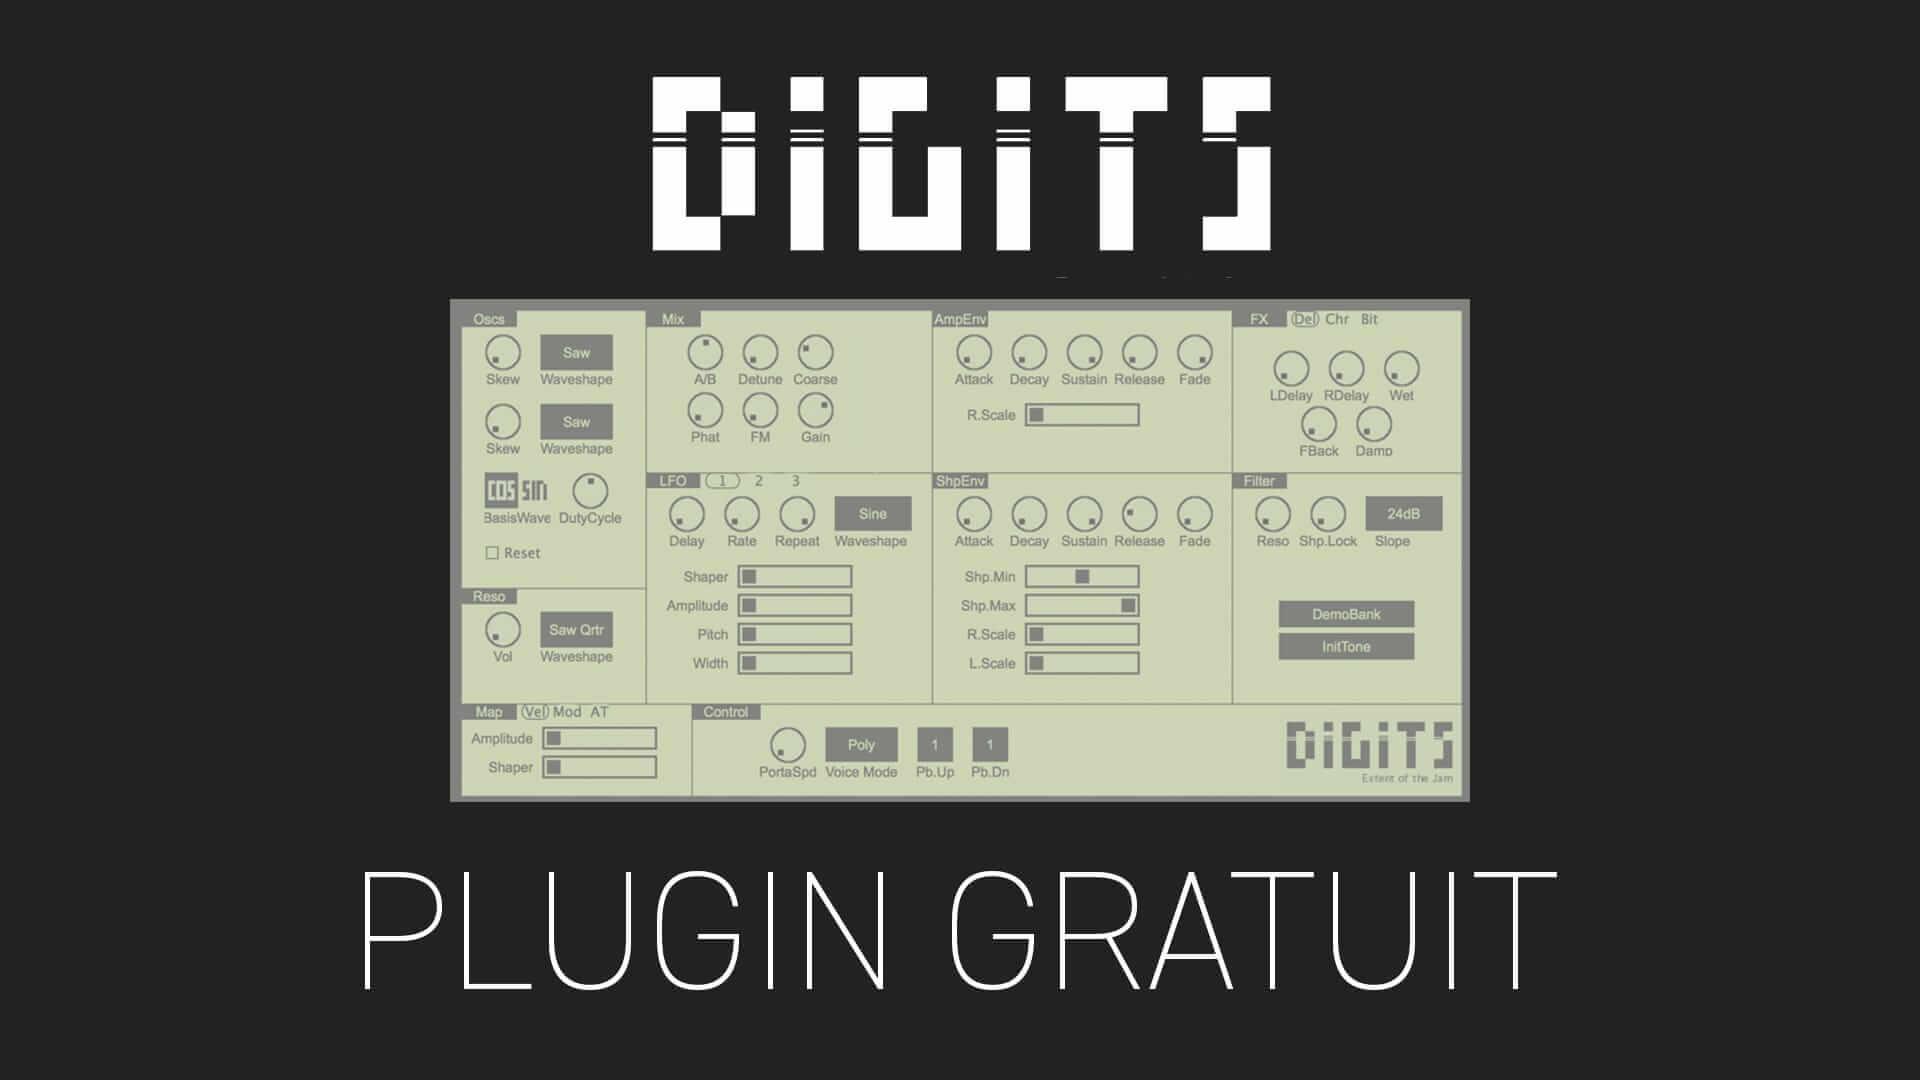 Digits 2 de Extent of the jam Plugin Gratuit